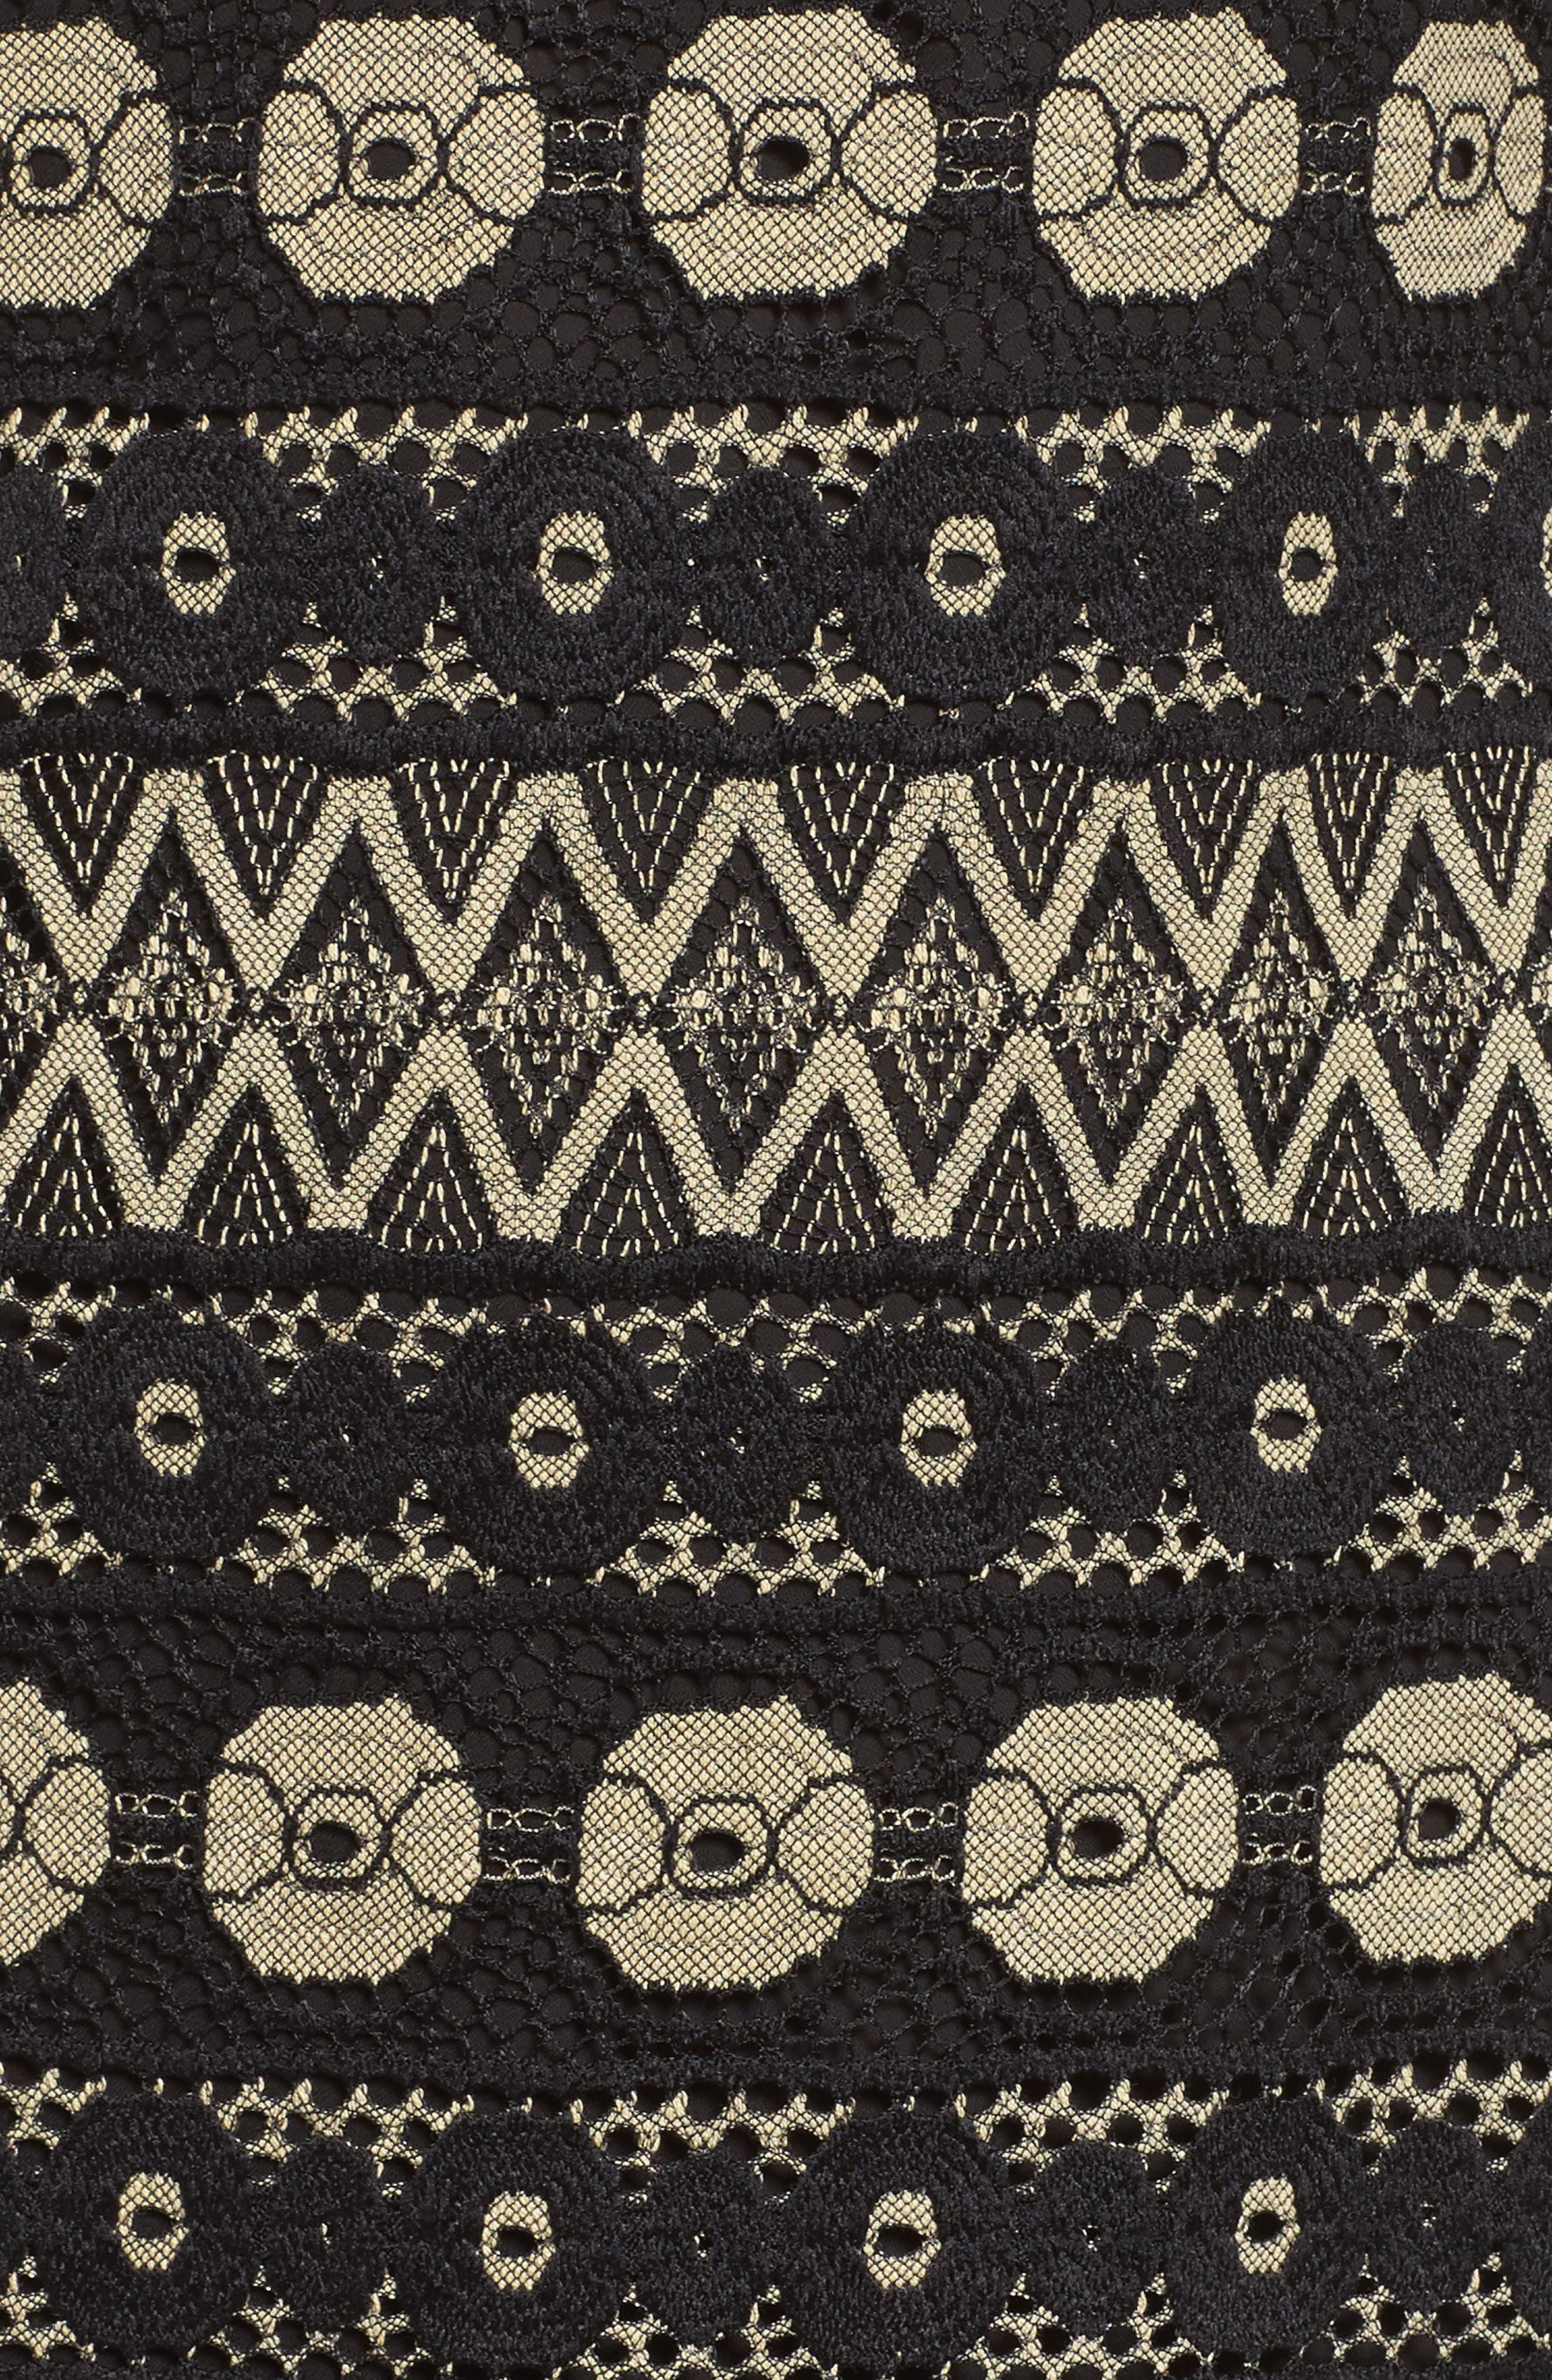 Off the Shoulder Lace Dress,                             Alternate thumbnail 5, color,                             001